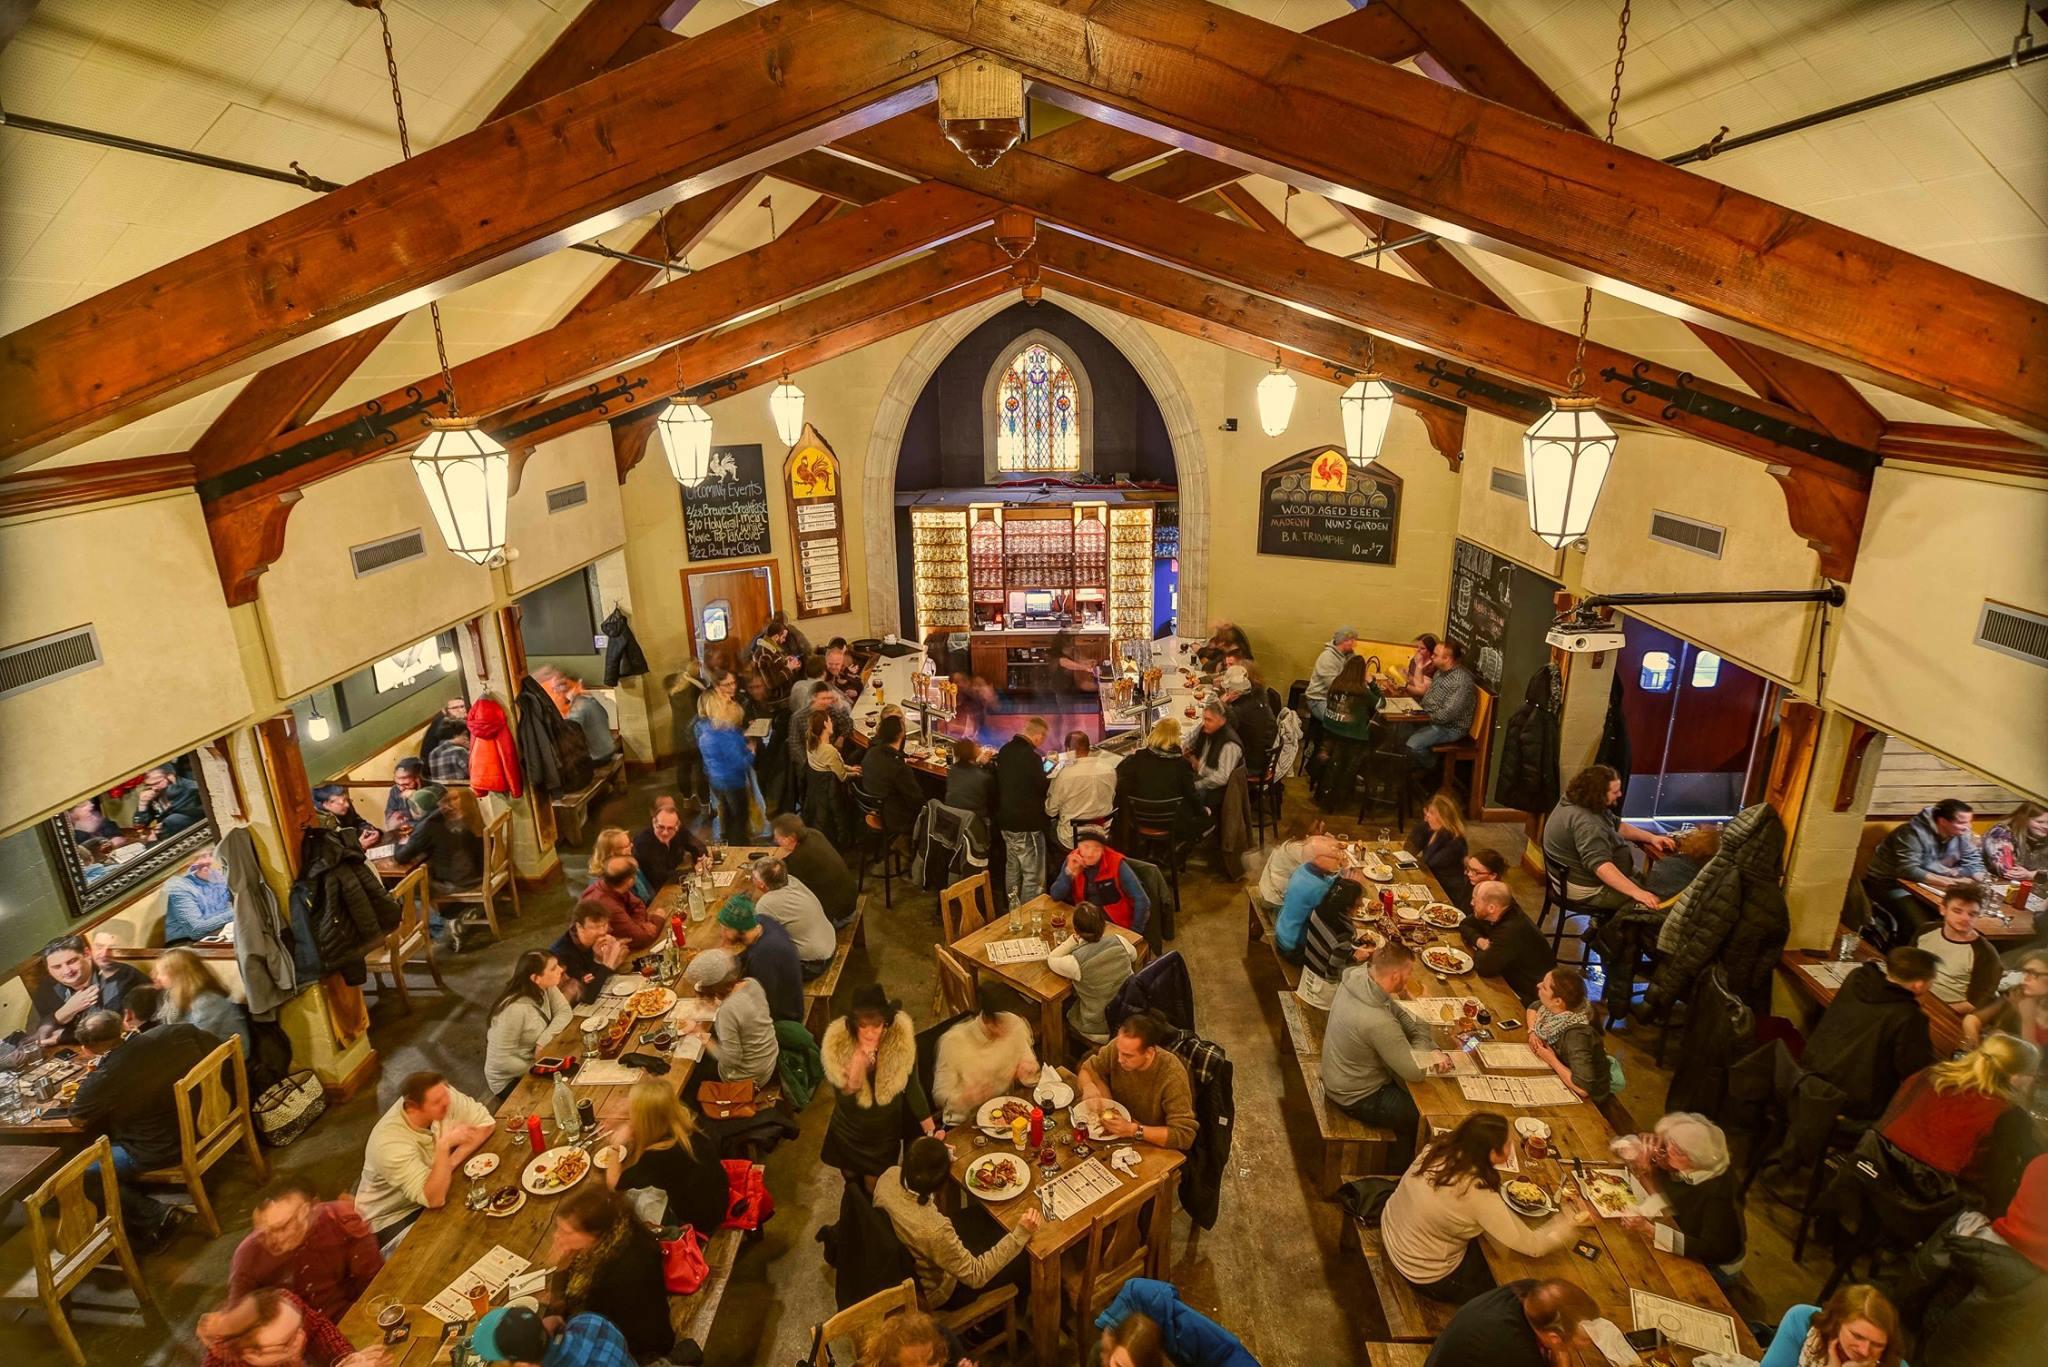 Brewery Vivant brewpub interior